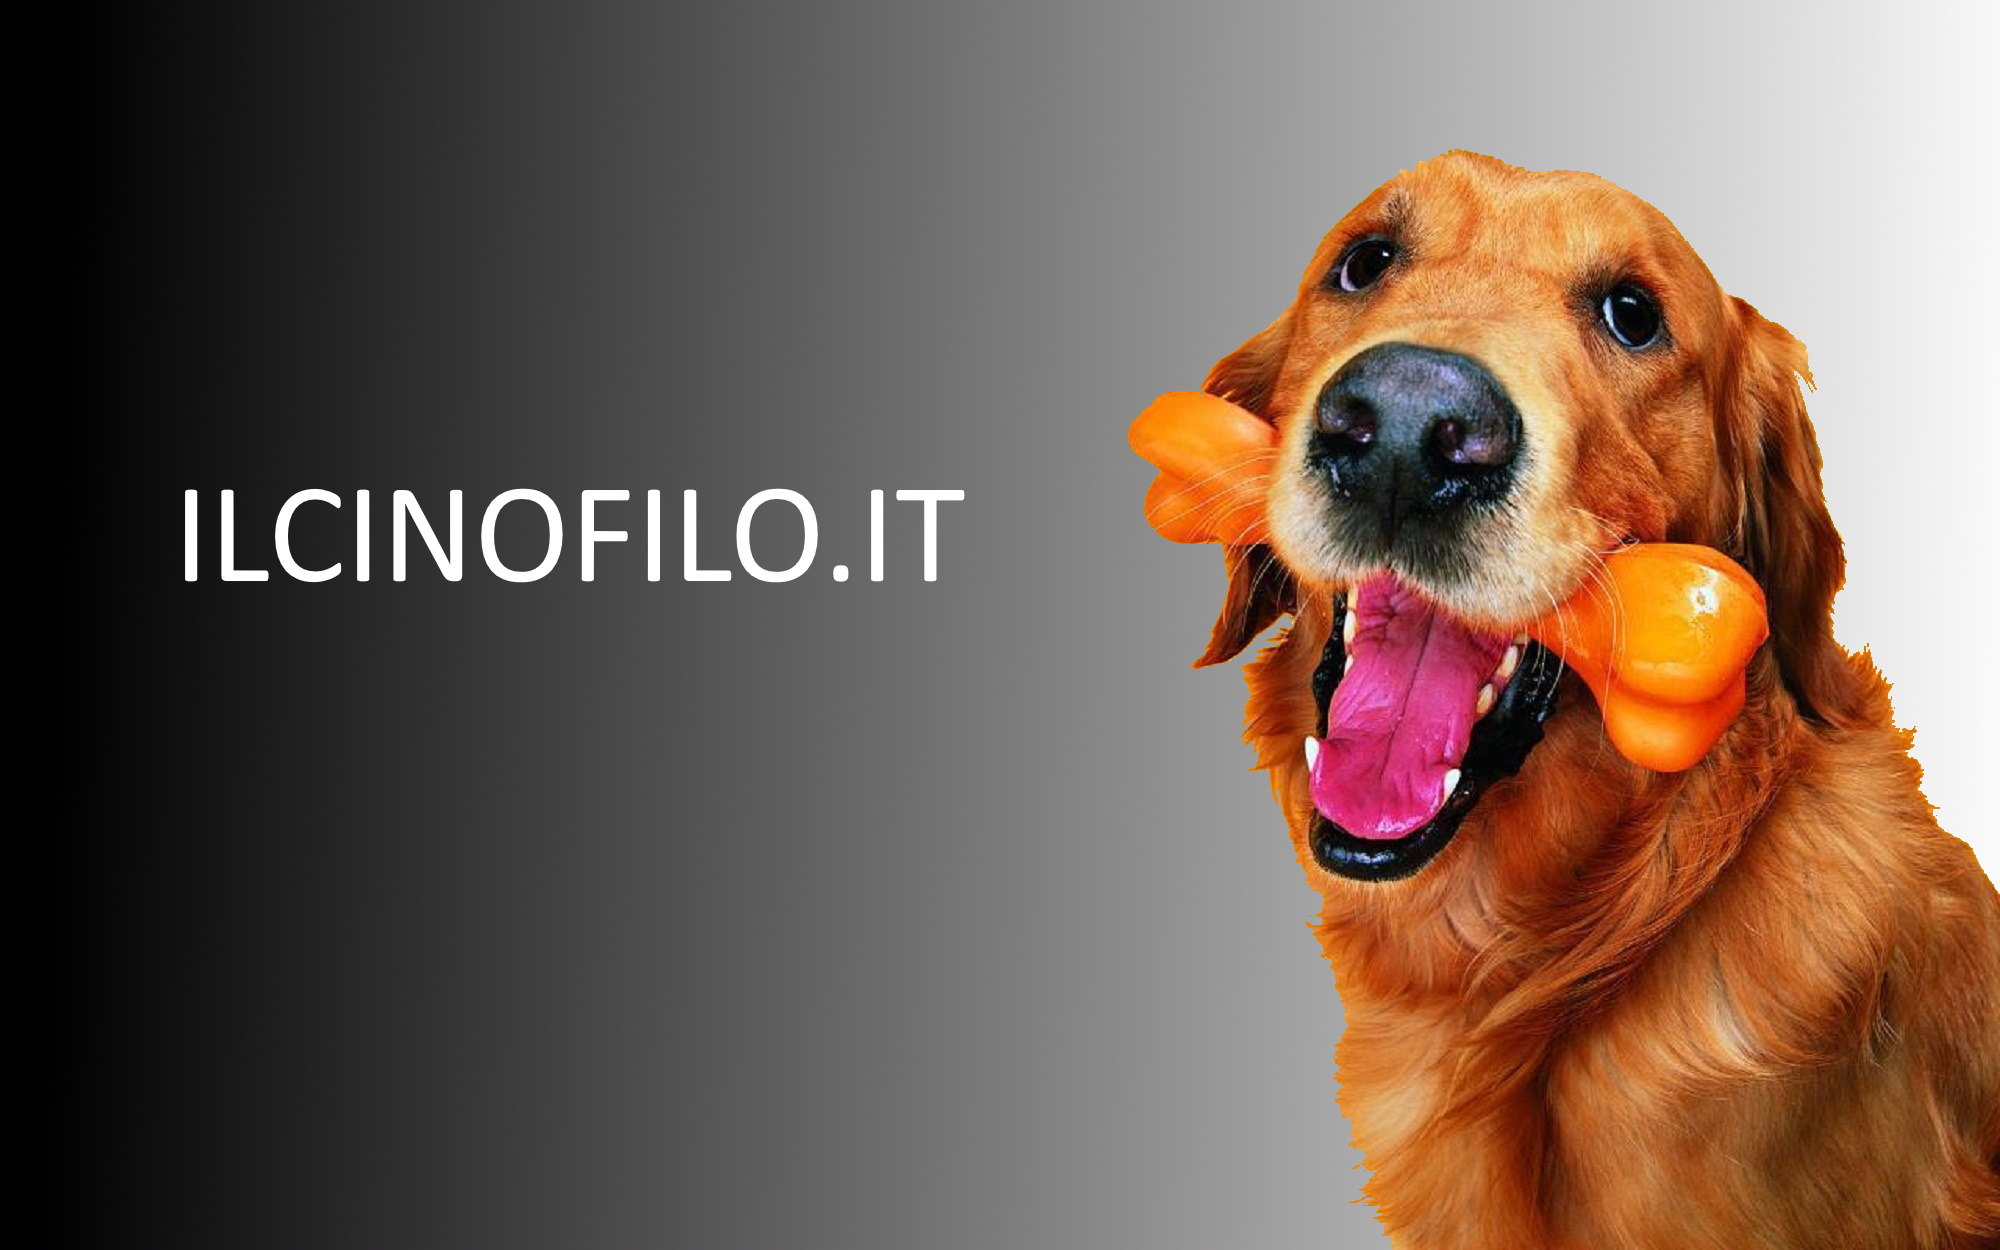 ILCINOFILO.IT